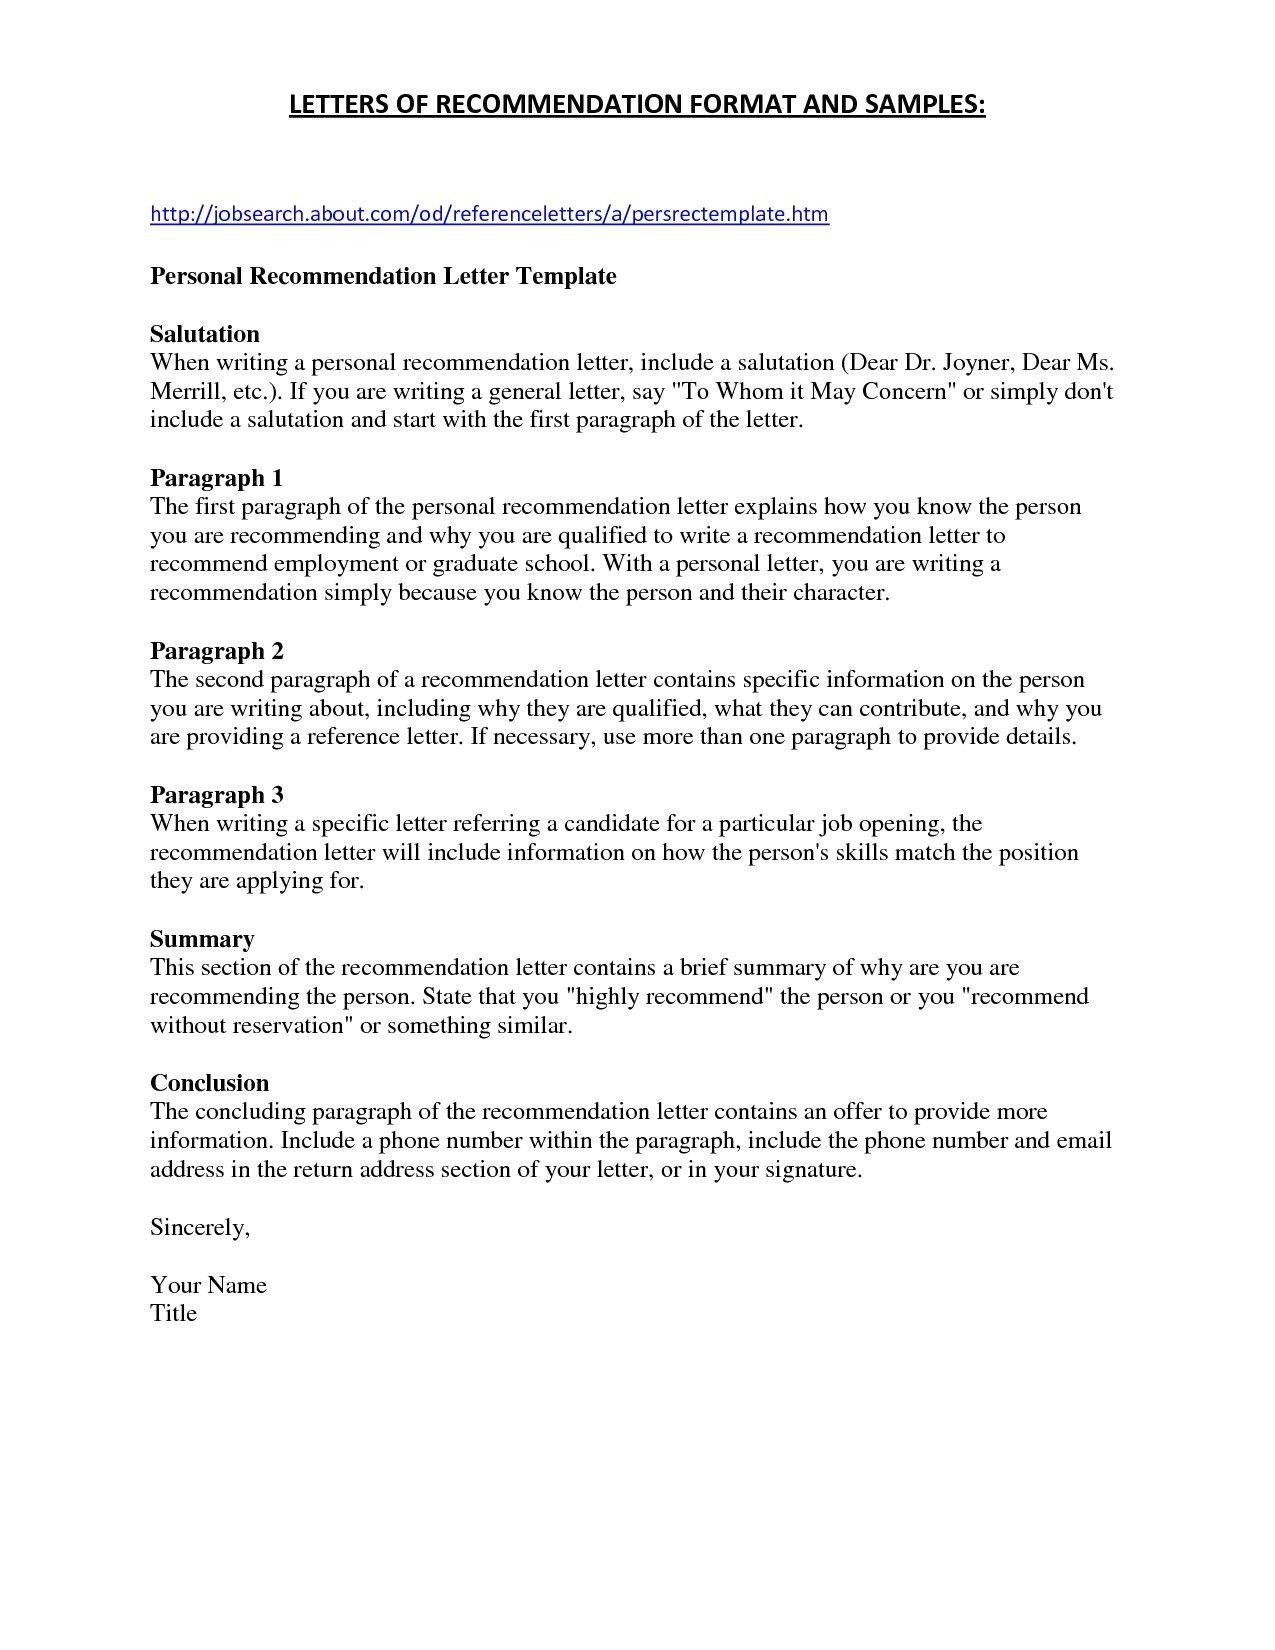 Elevator Speech Worksheet